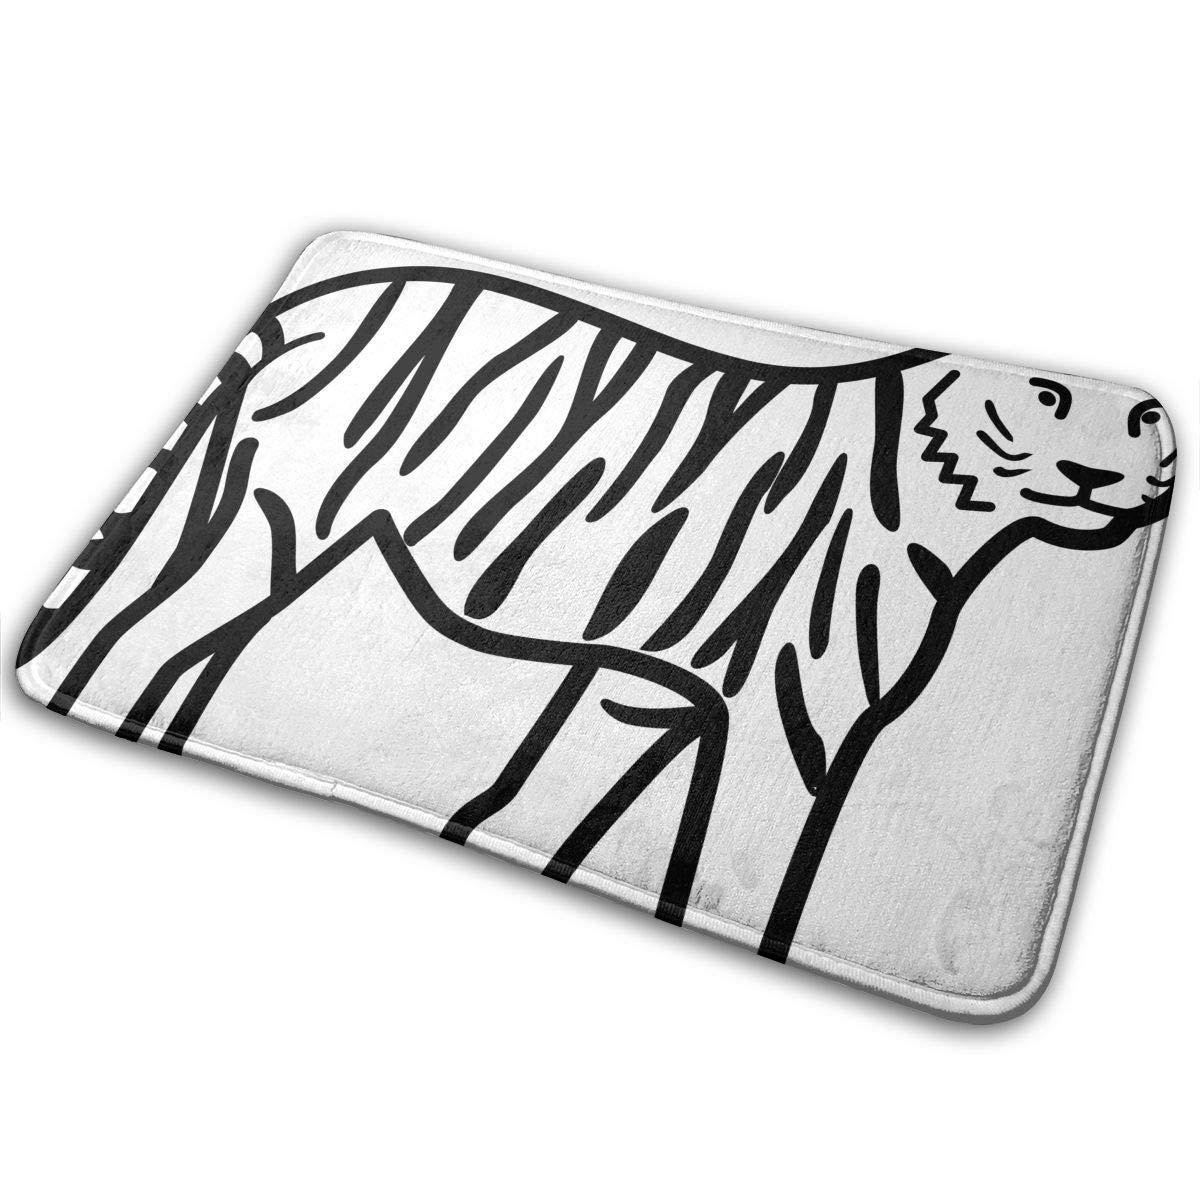 White tiger sketches home door mat super absorbent slide proof front floor matsoft coral memory foam carpet bathroom rubber entrance rugs for indoor